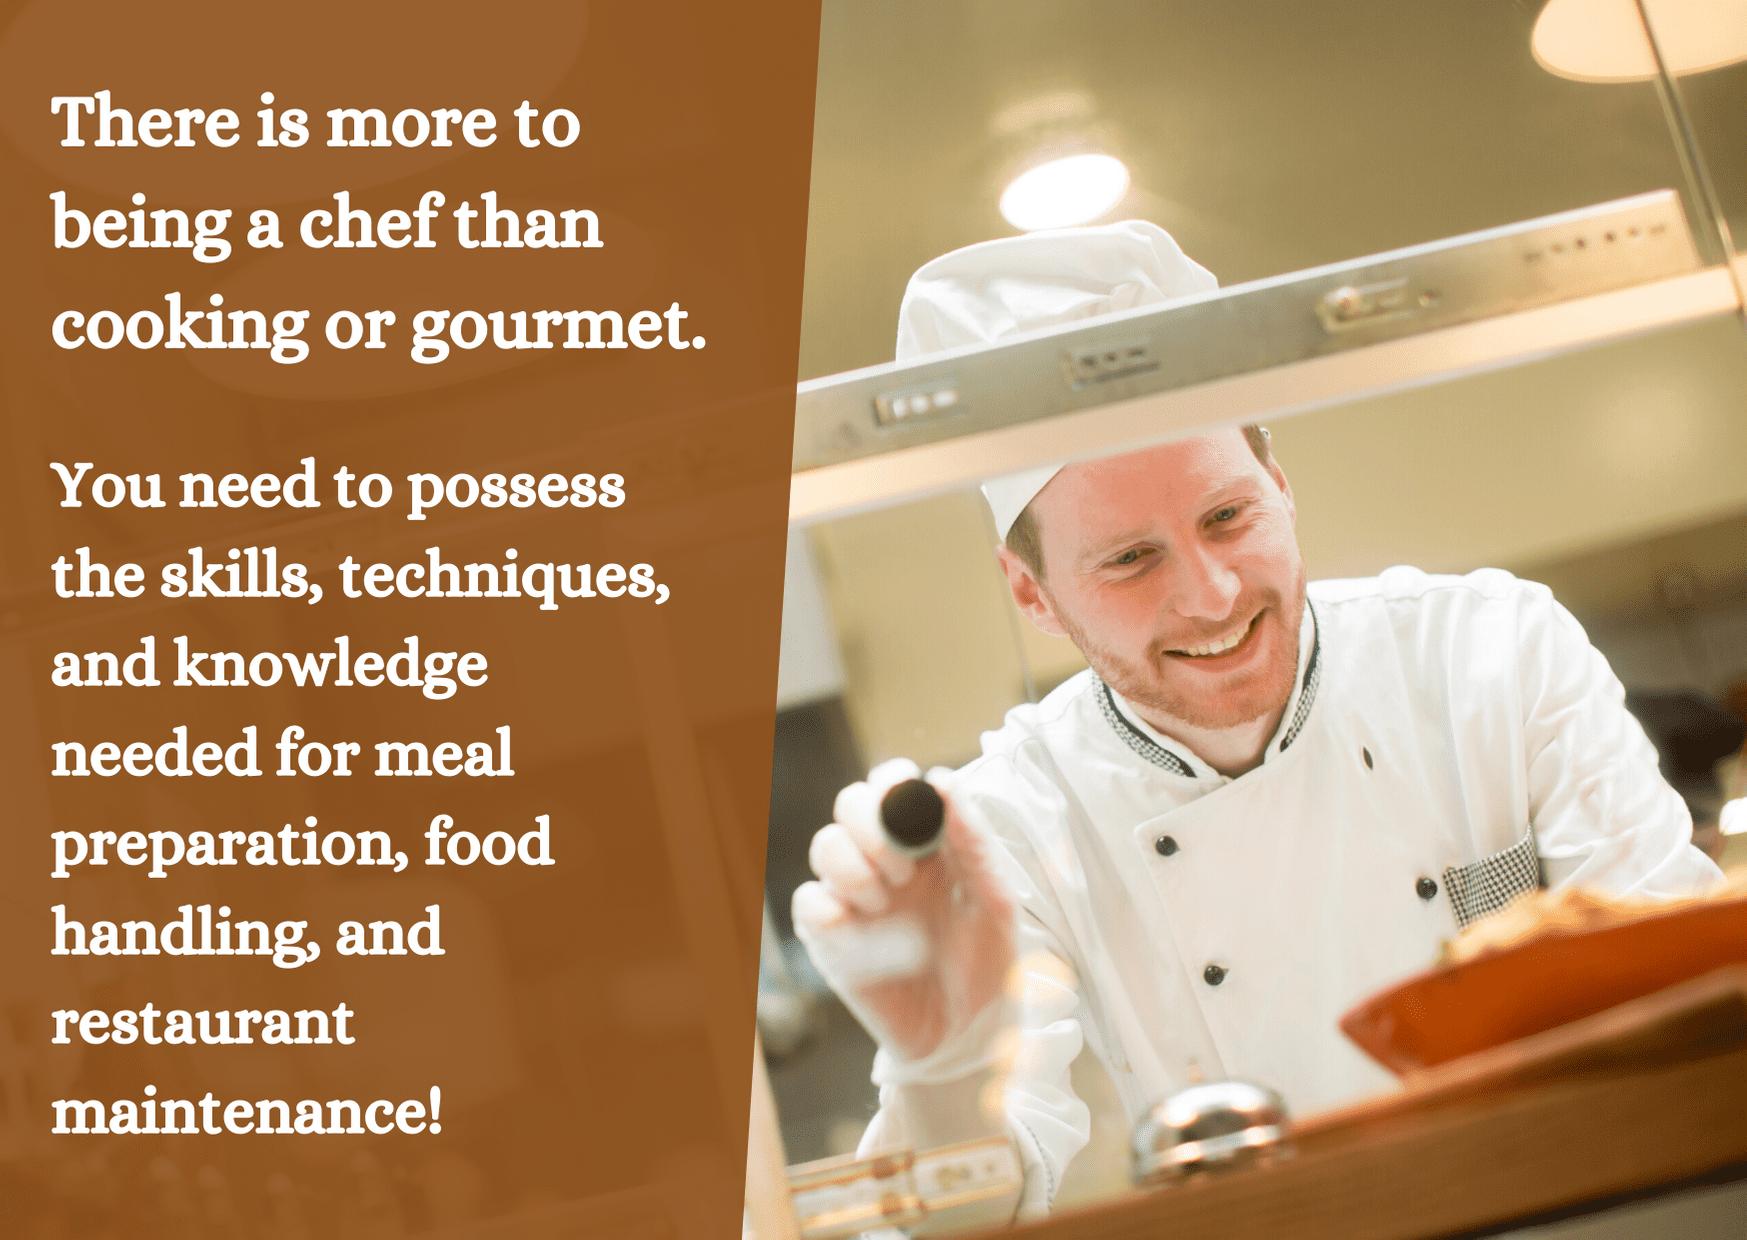 Chef Skills